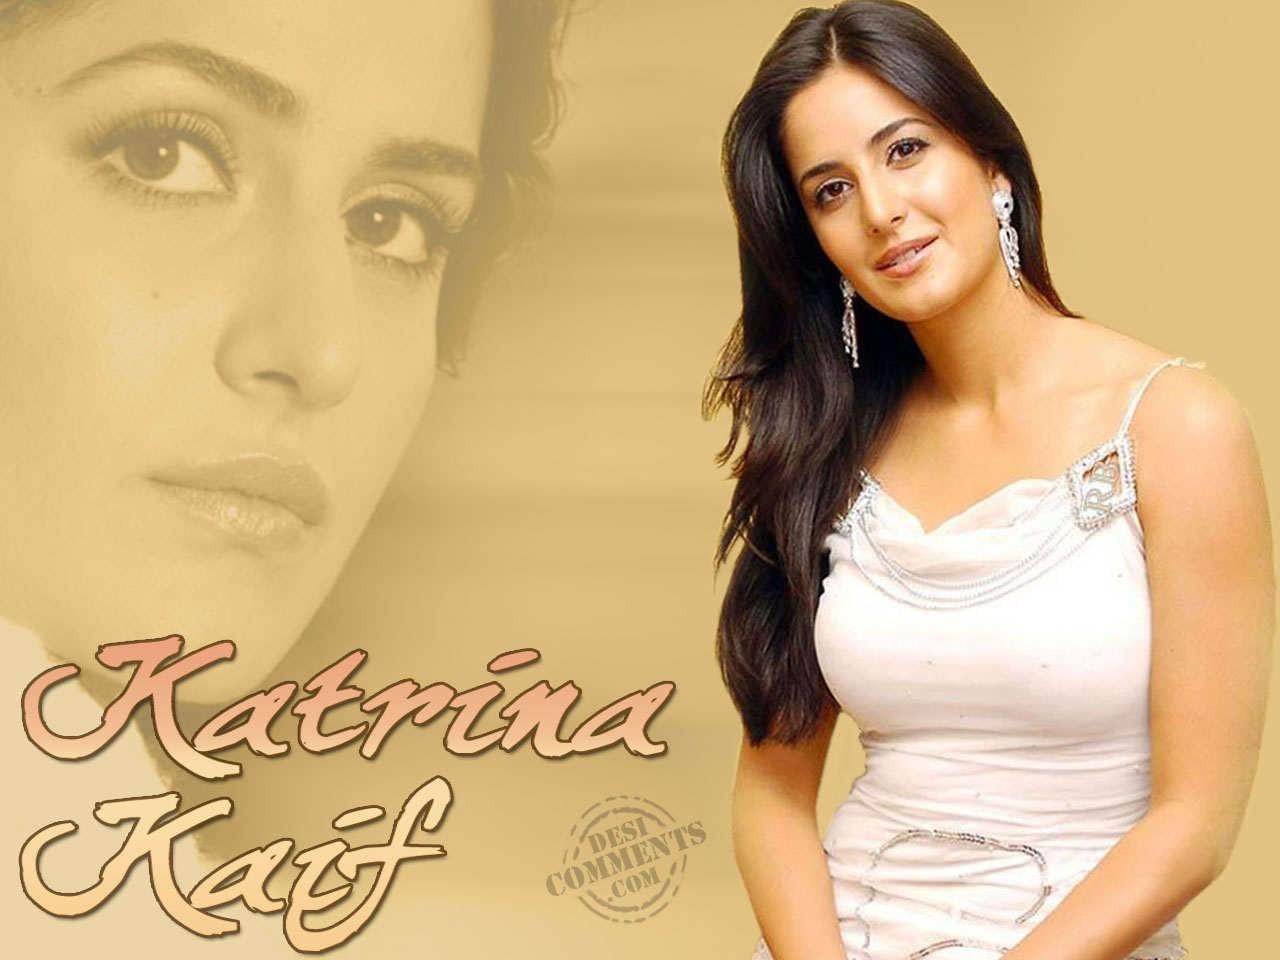 Telugu All Images: Katrina Kife hot images